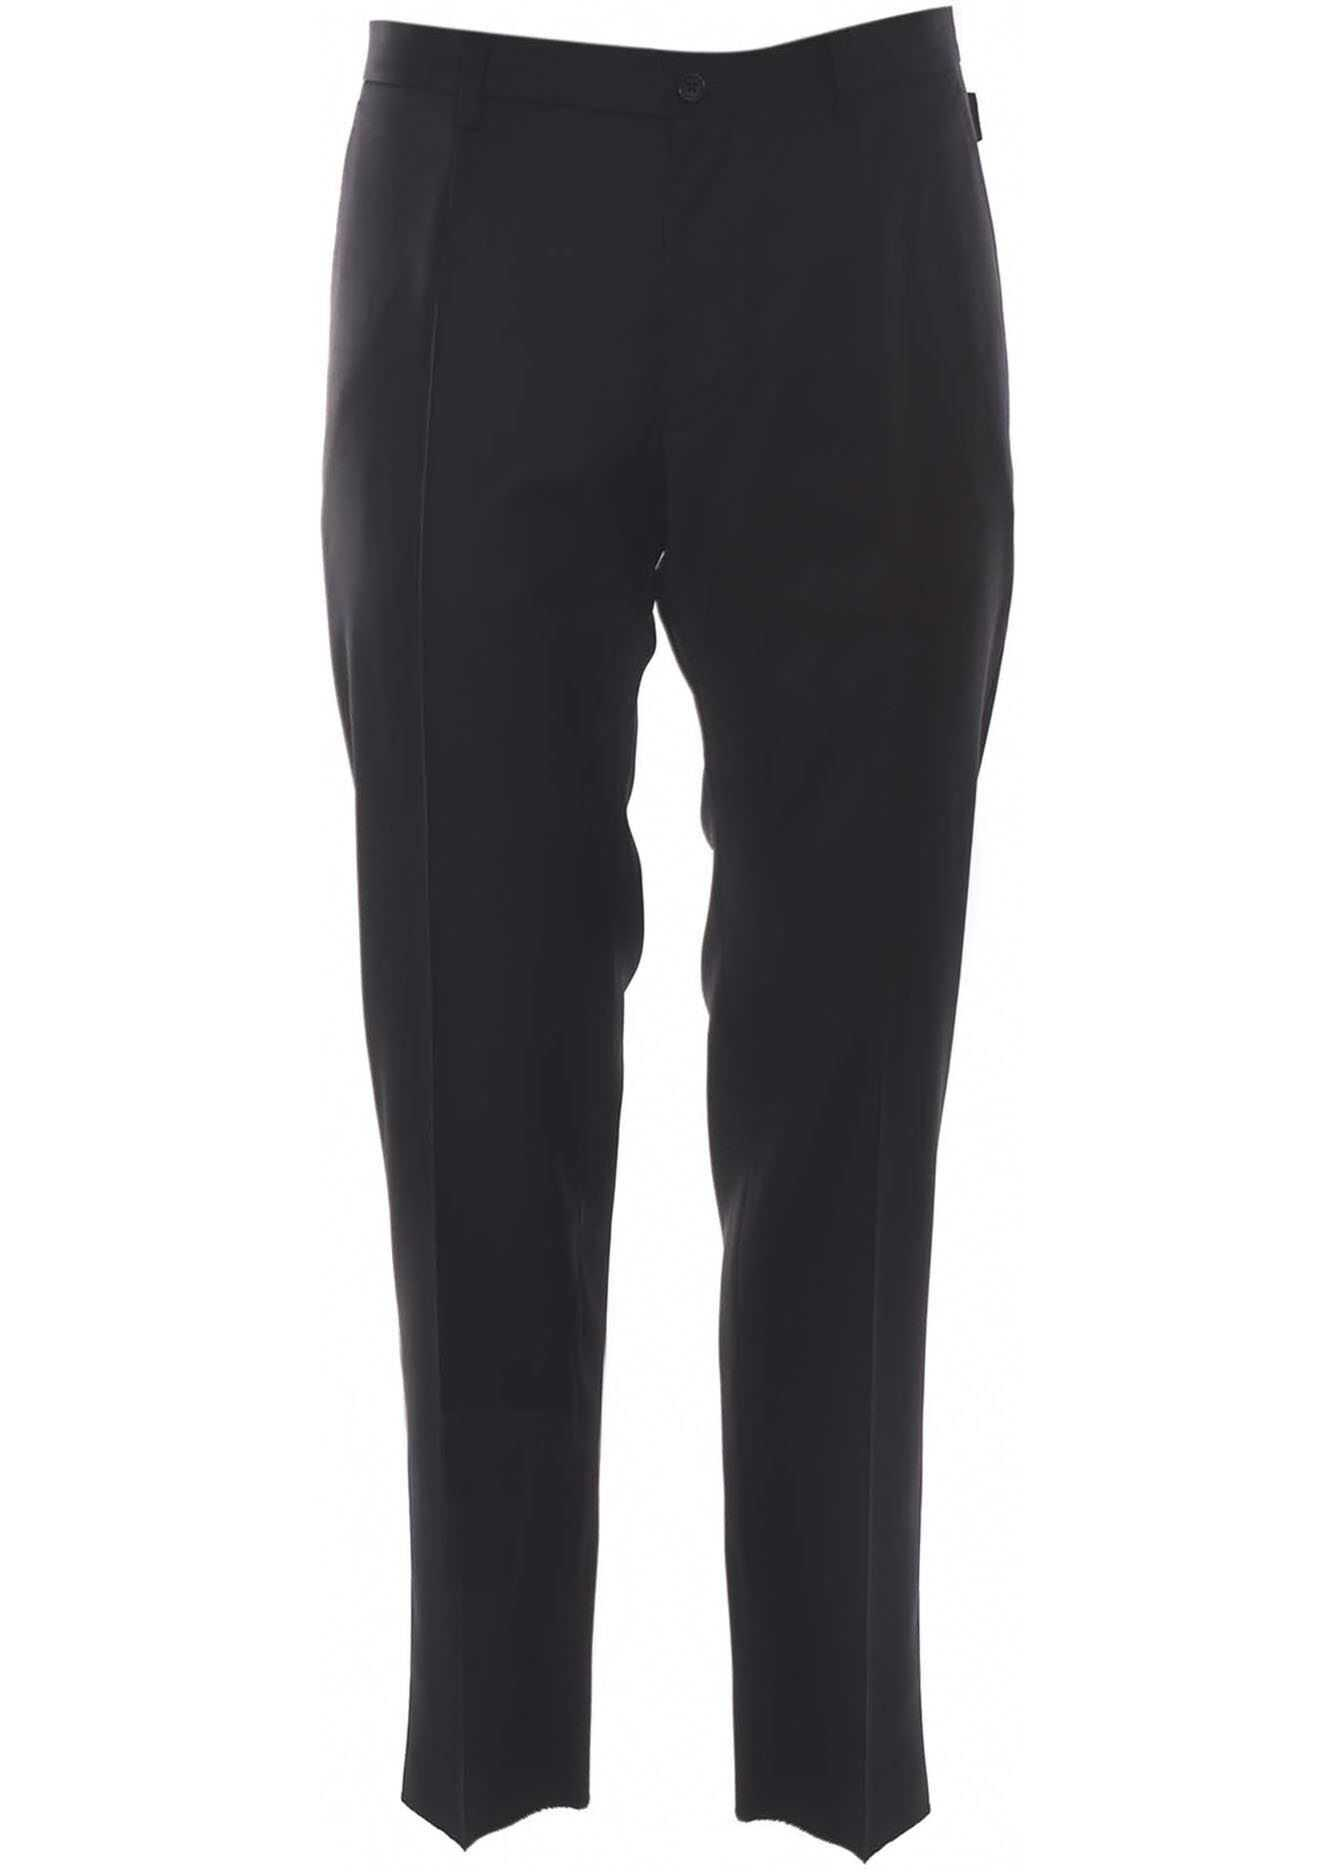 Dolce & Gabbana Tailored Trousers In Black Black imagine